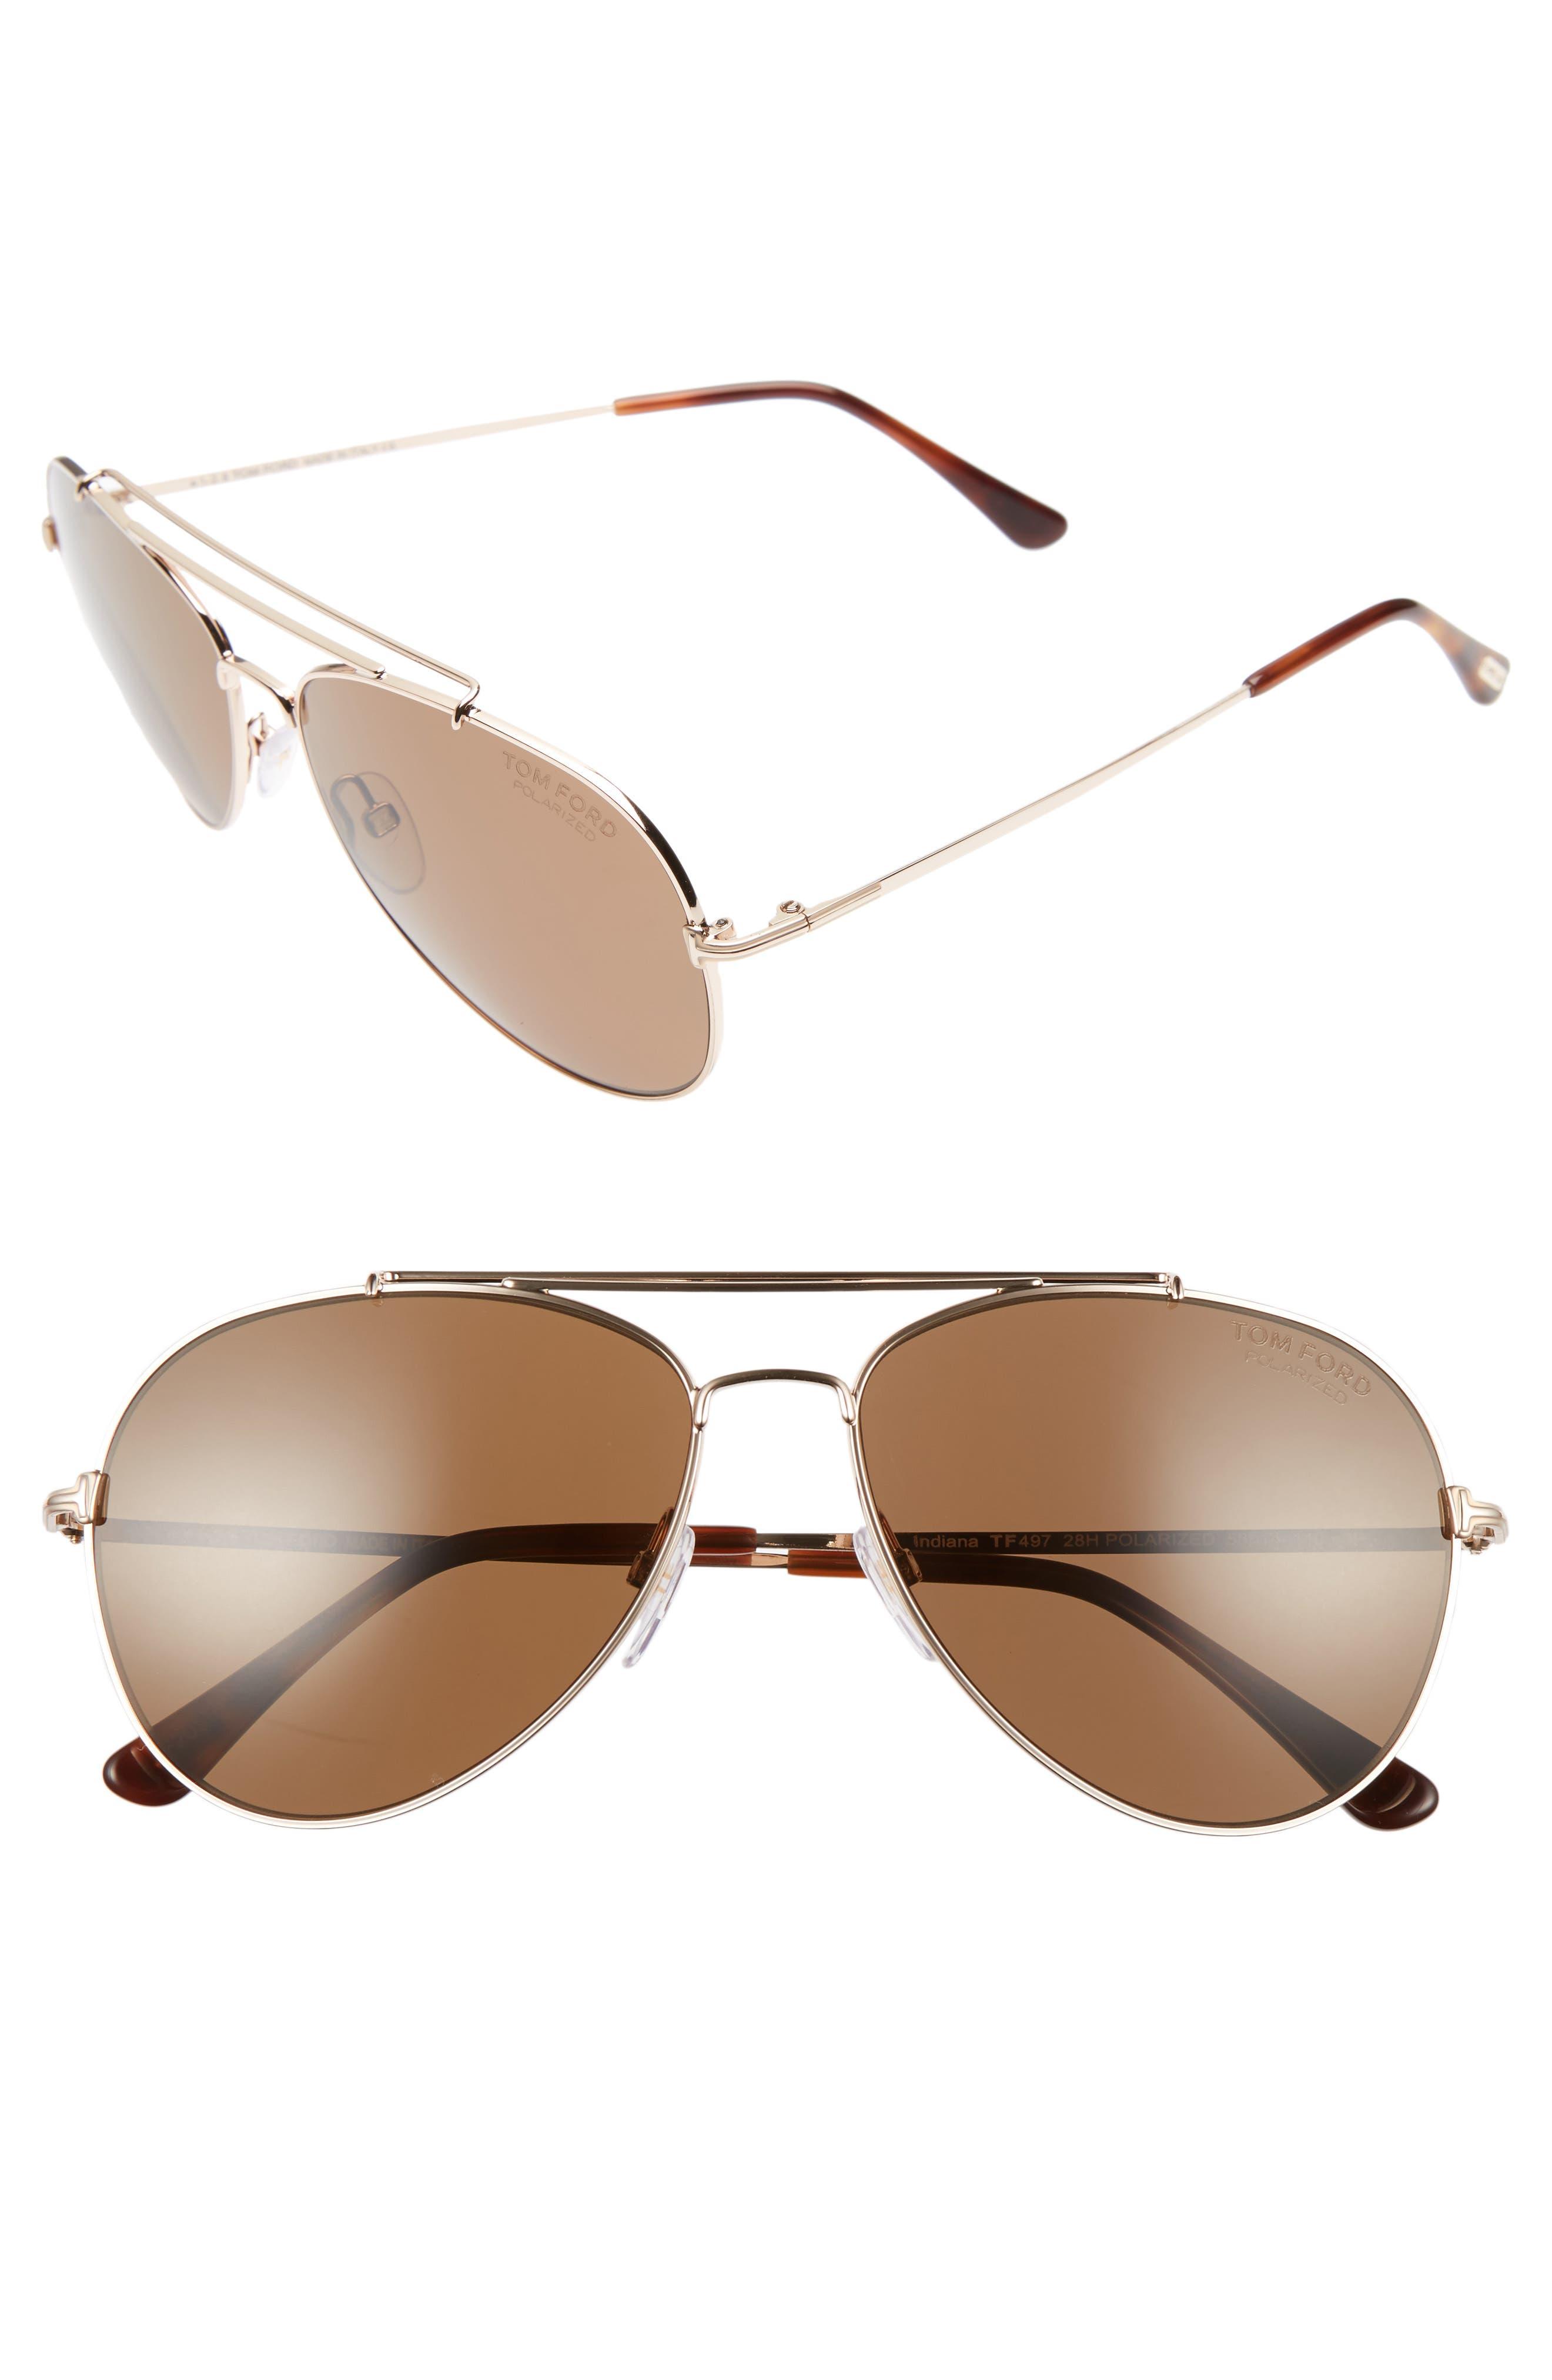 Alternate Image 1 Selected - Tom Ford Indiana 58mm Polarized Aviator Sunglasses